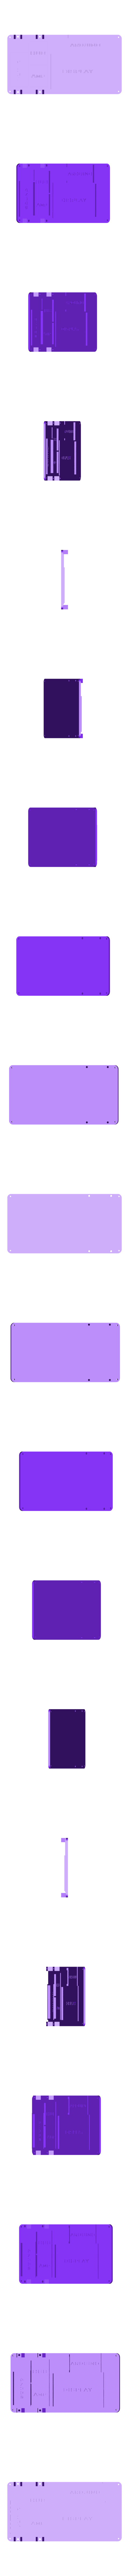 GamePi_Zero_PCB_Mount.stl Download free STL file GamePi Zero • 3D printer template, araymbox